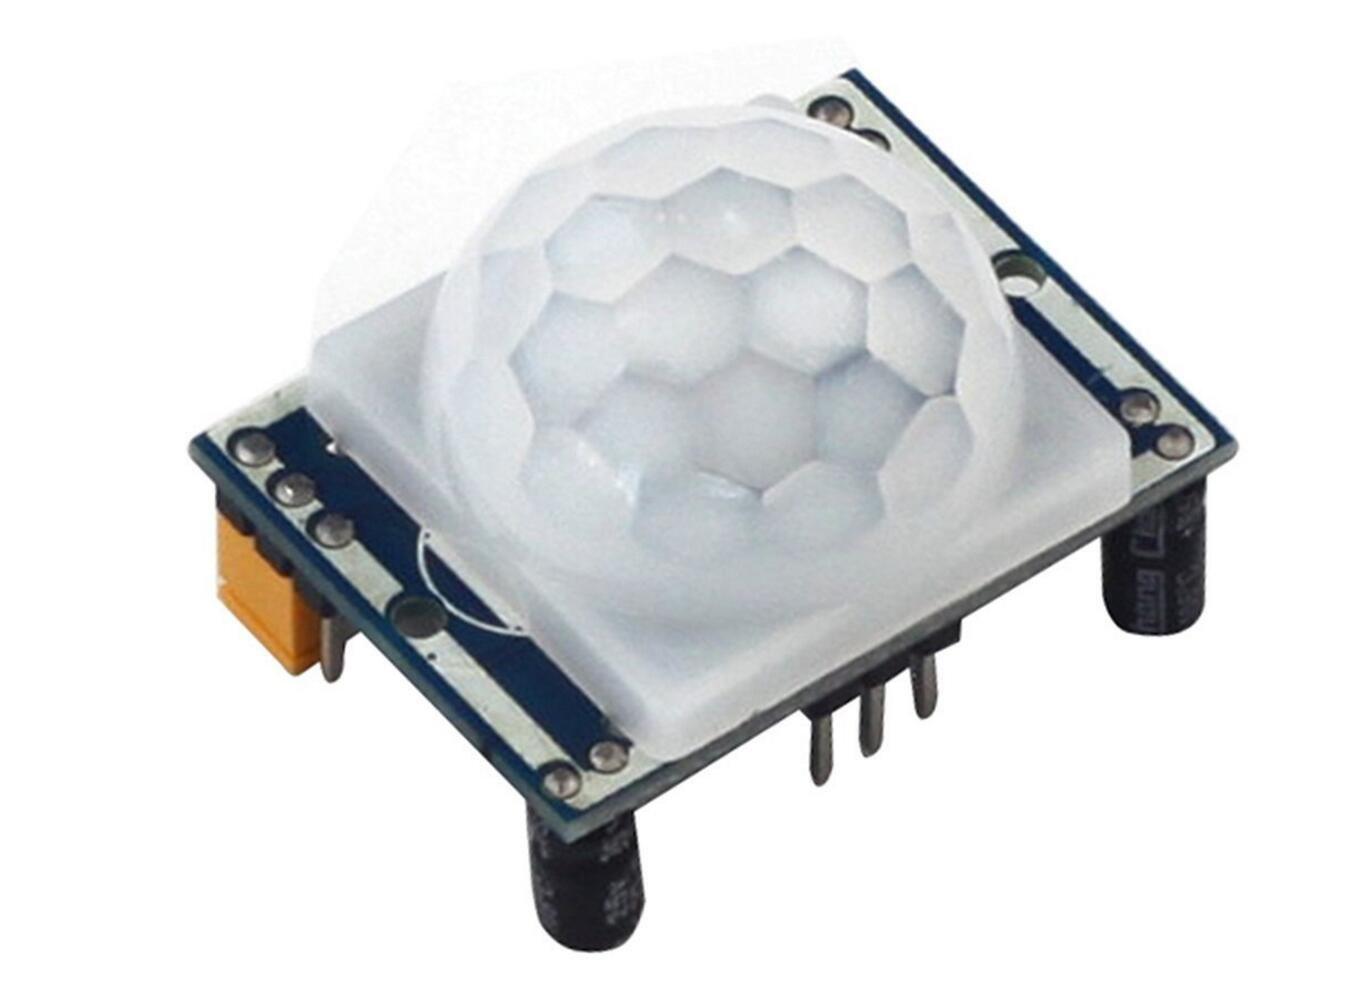 haoyishang HC-SR501 piroelé ctrico infrarrojo PIR Motion Sensor Detector mó dulo ajustar Ir cuerpo Sensor Junta